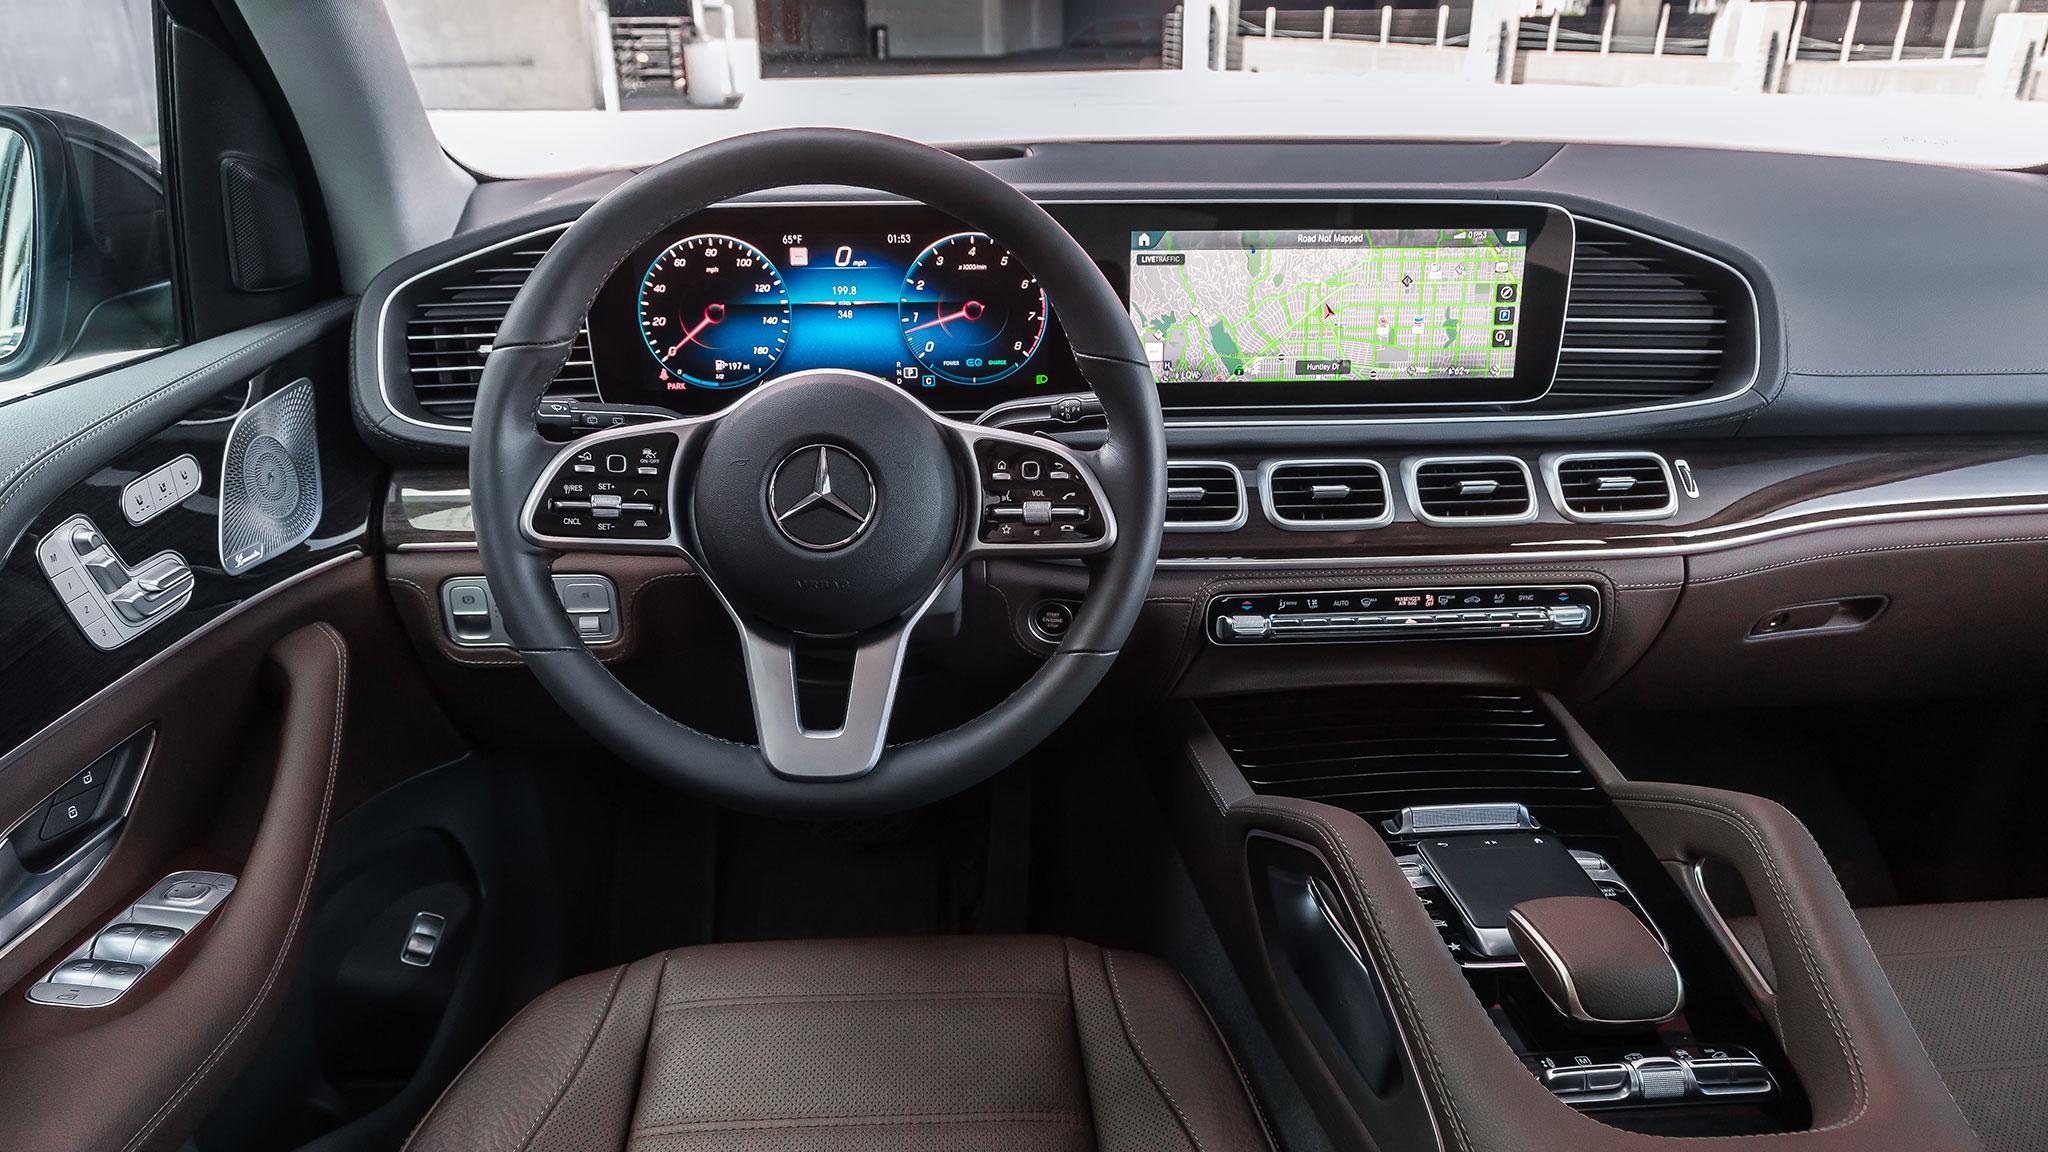 2020 Mercedes Benz Gle 450 4matic Review Emercedesbenz